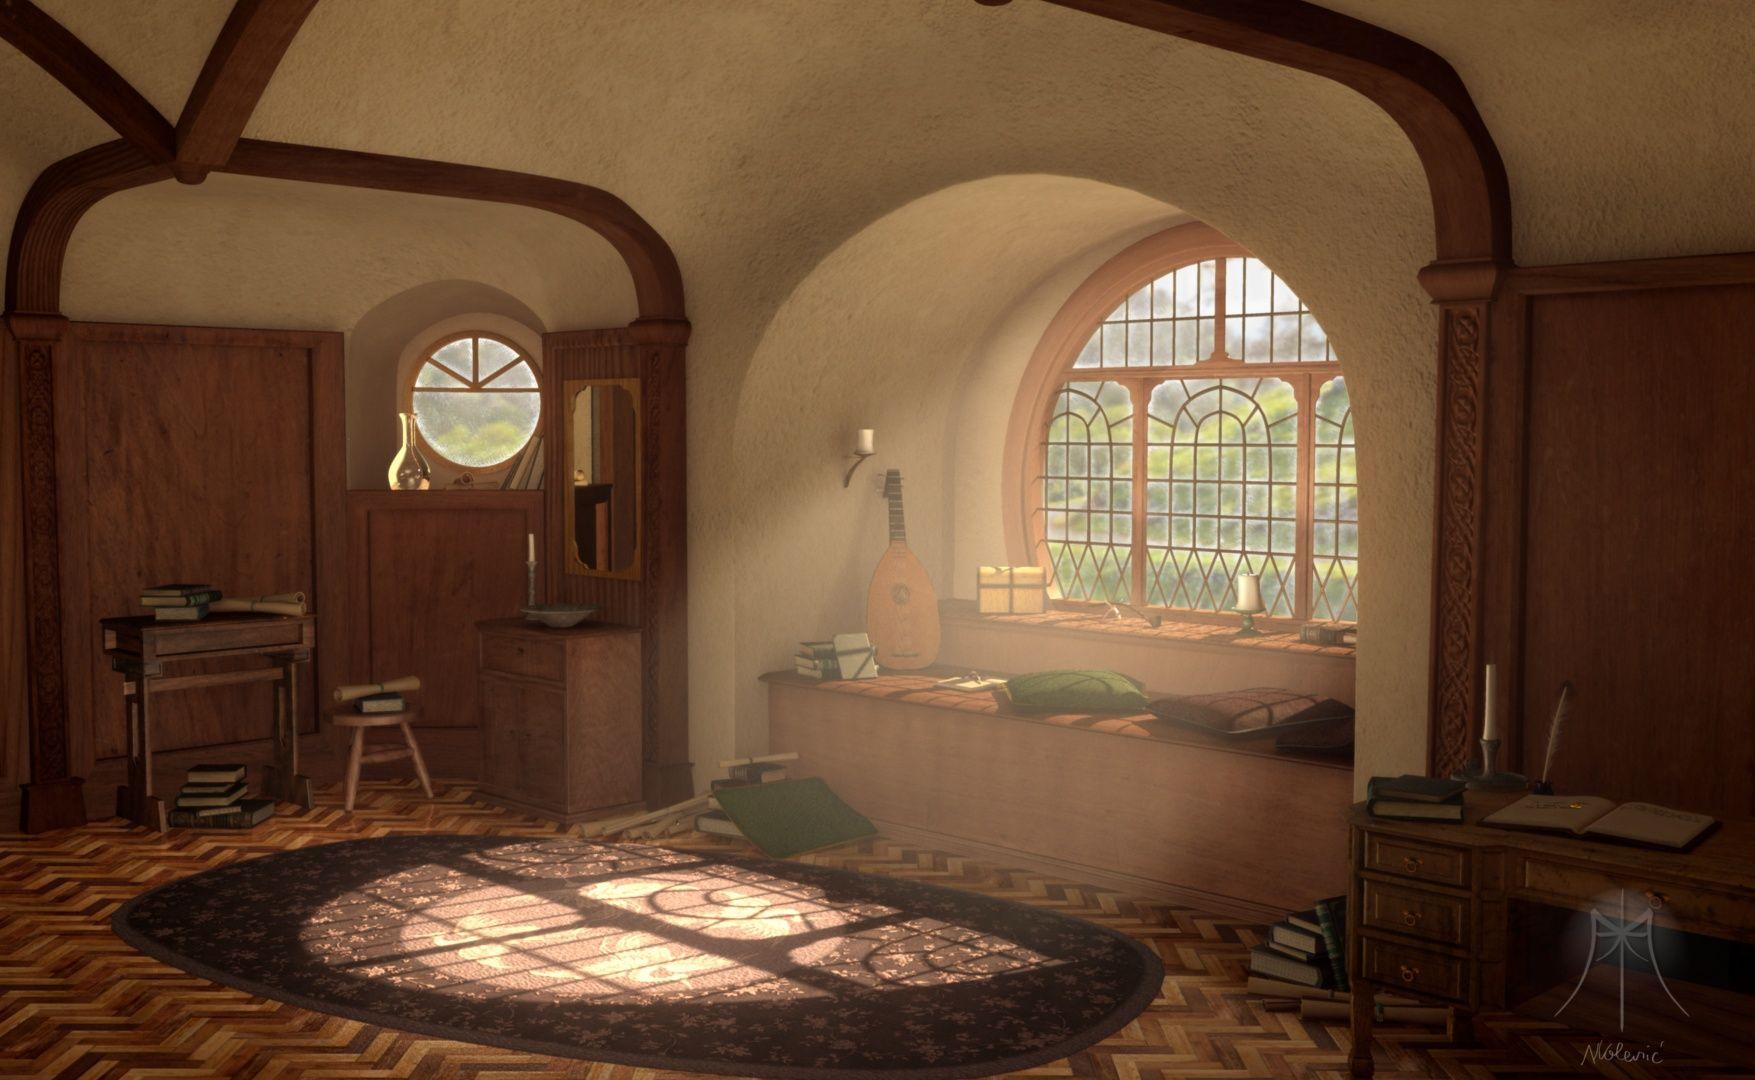 Hobbit Interior Design bag end window | board of the rings | pinterest | window, hobbit